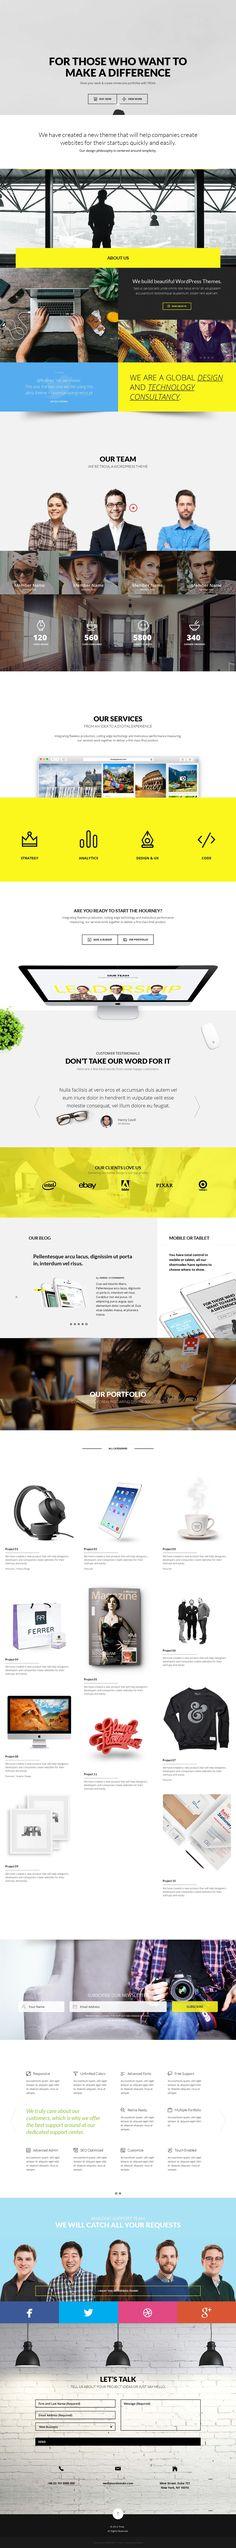 Troia — Responsive One/Multi Page Theme #webdesign #design